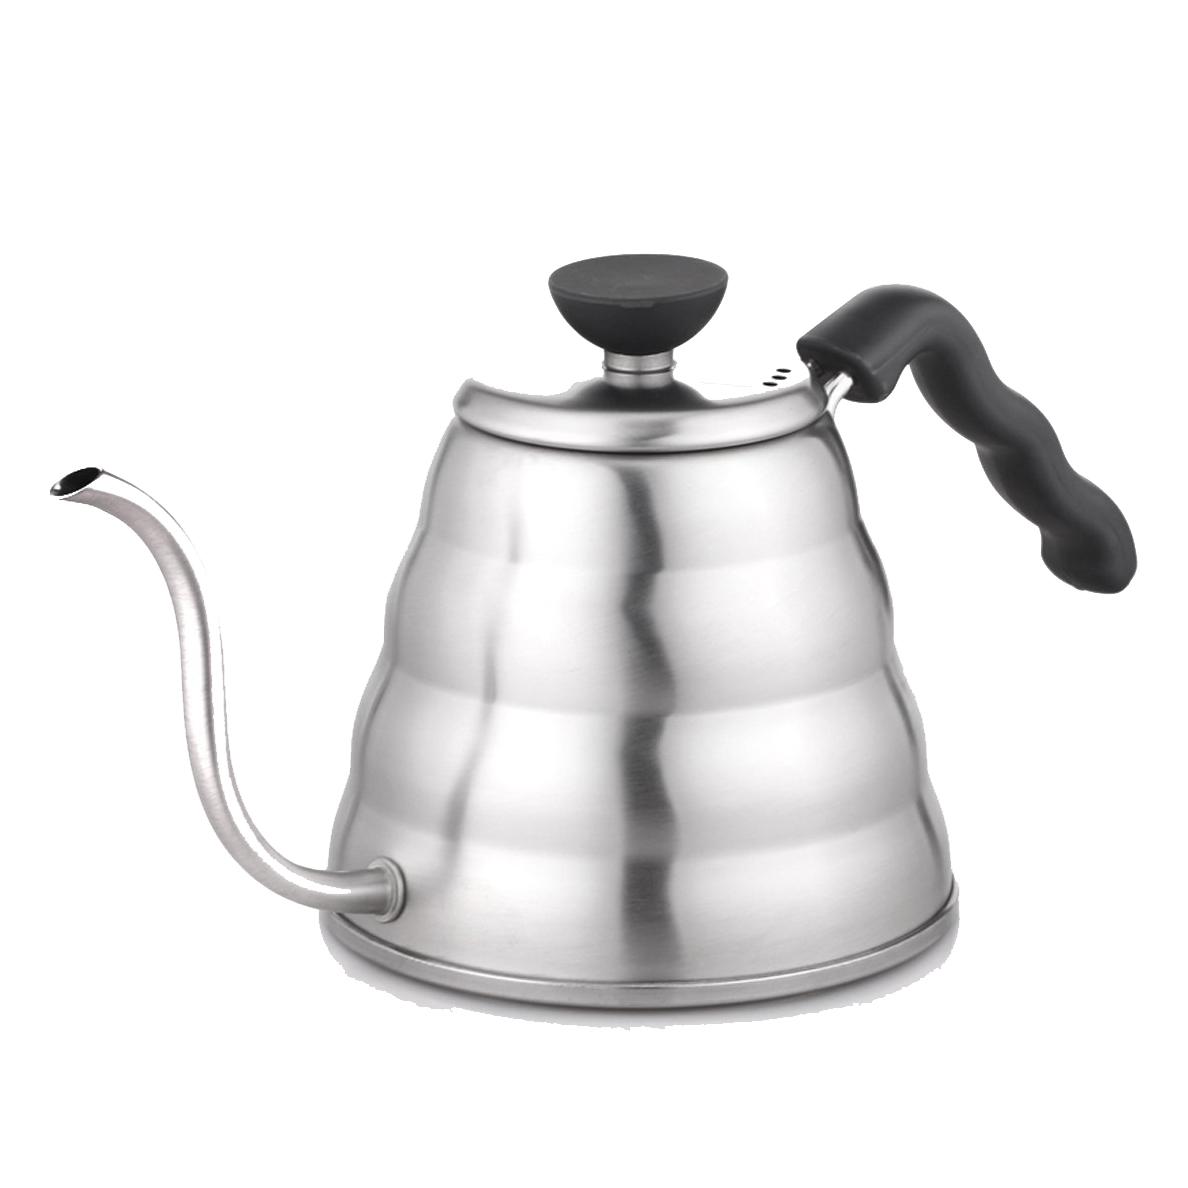 Hario V60 Buono Coffee Drip Kettle 1200ml - VKB-120HSV